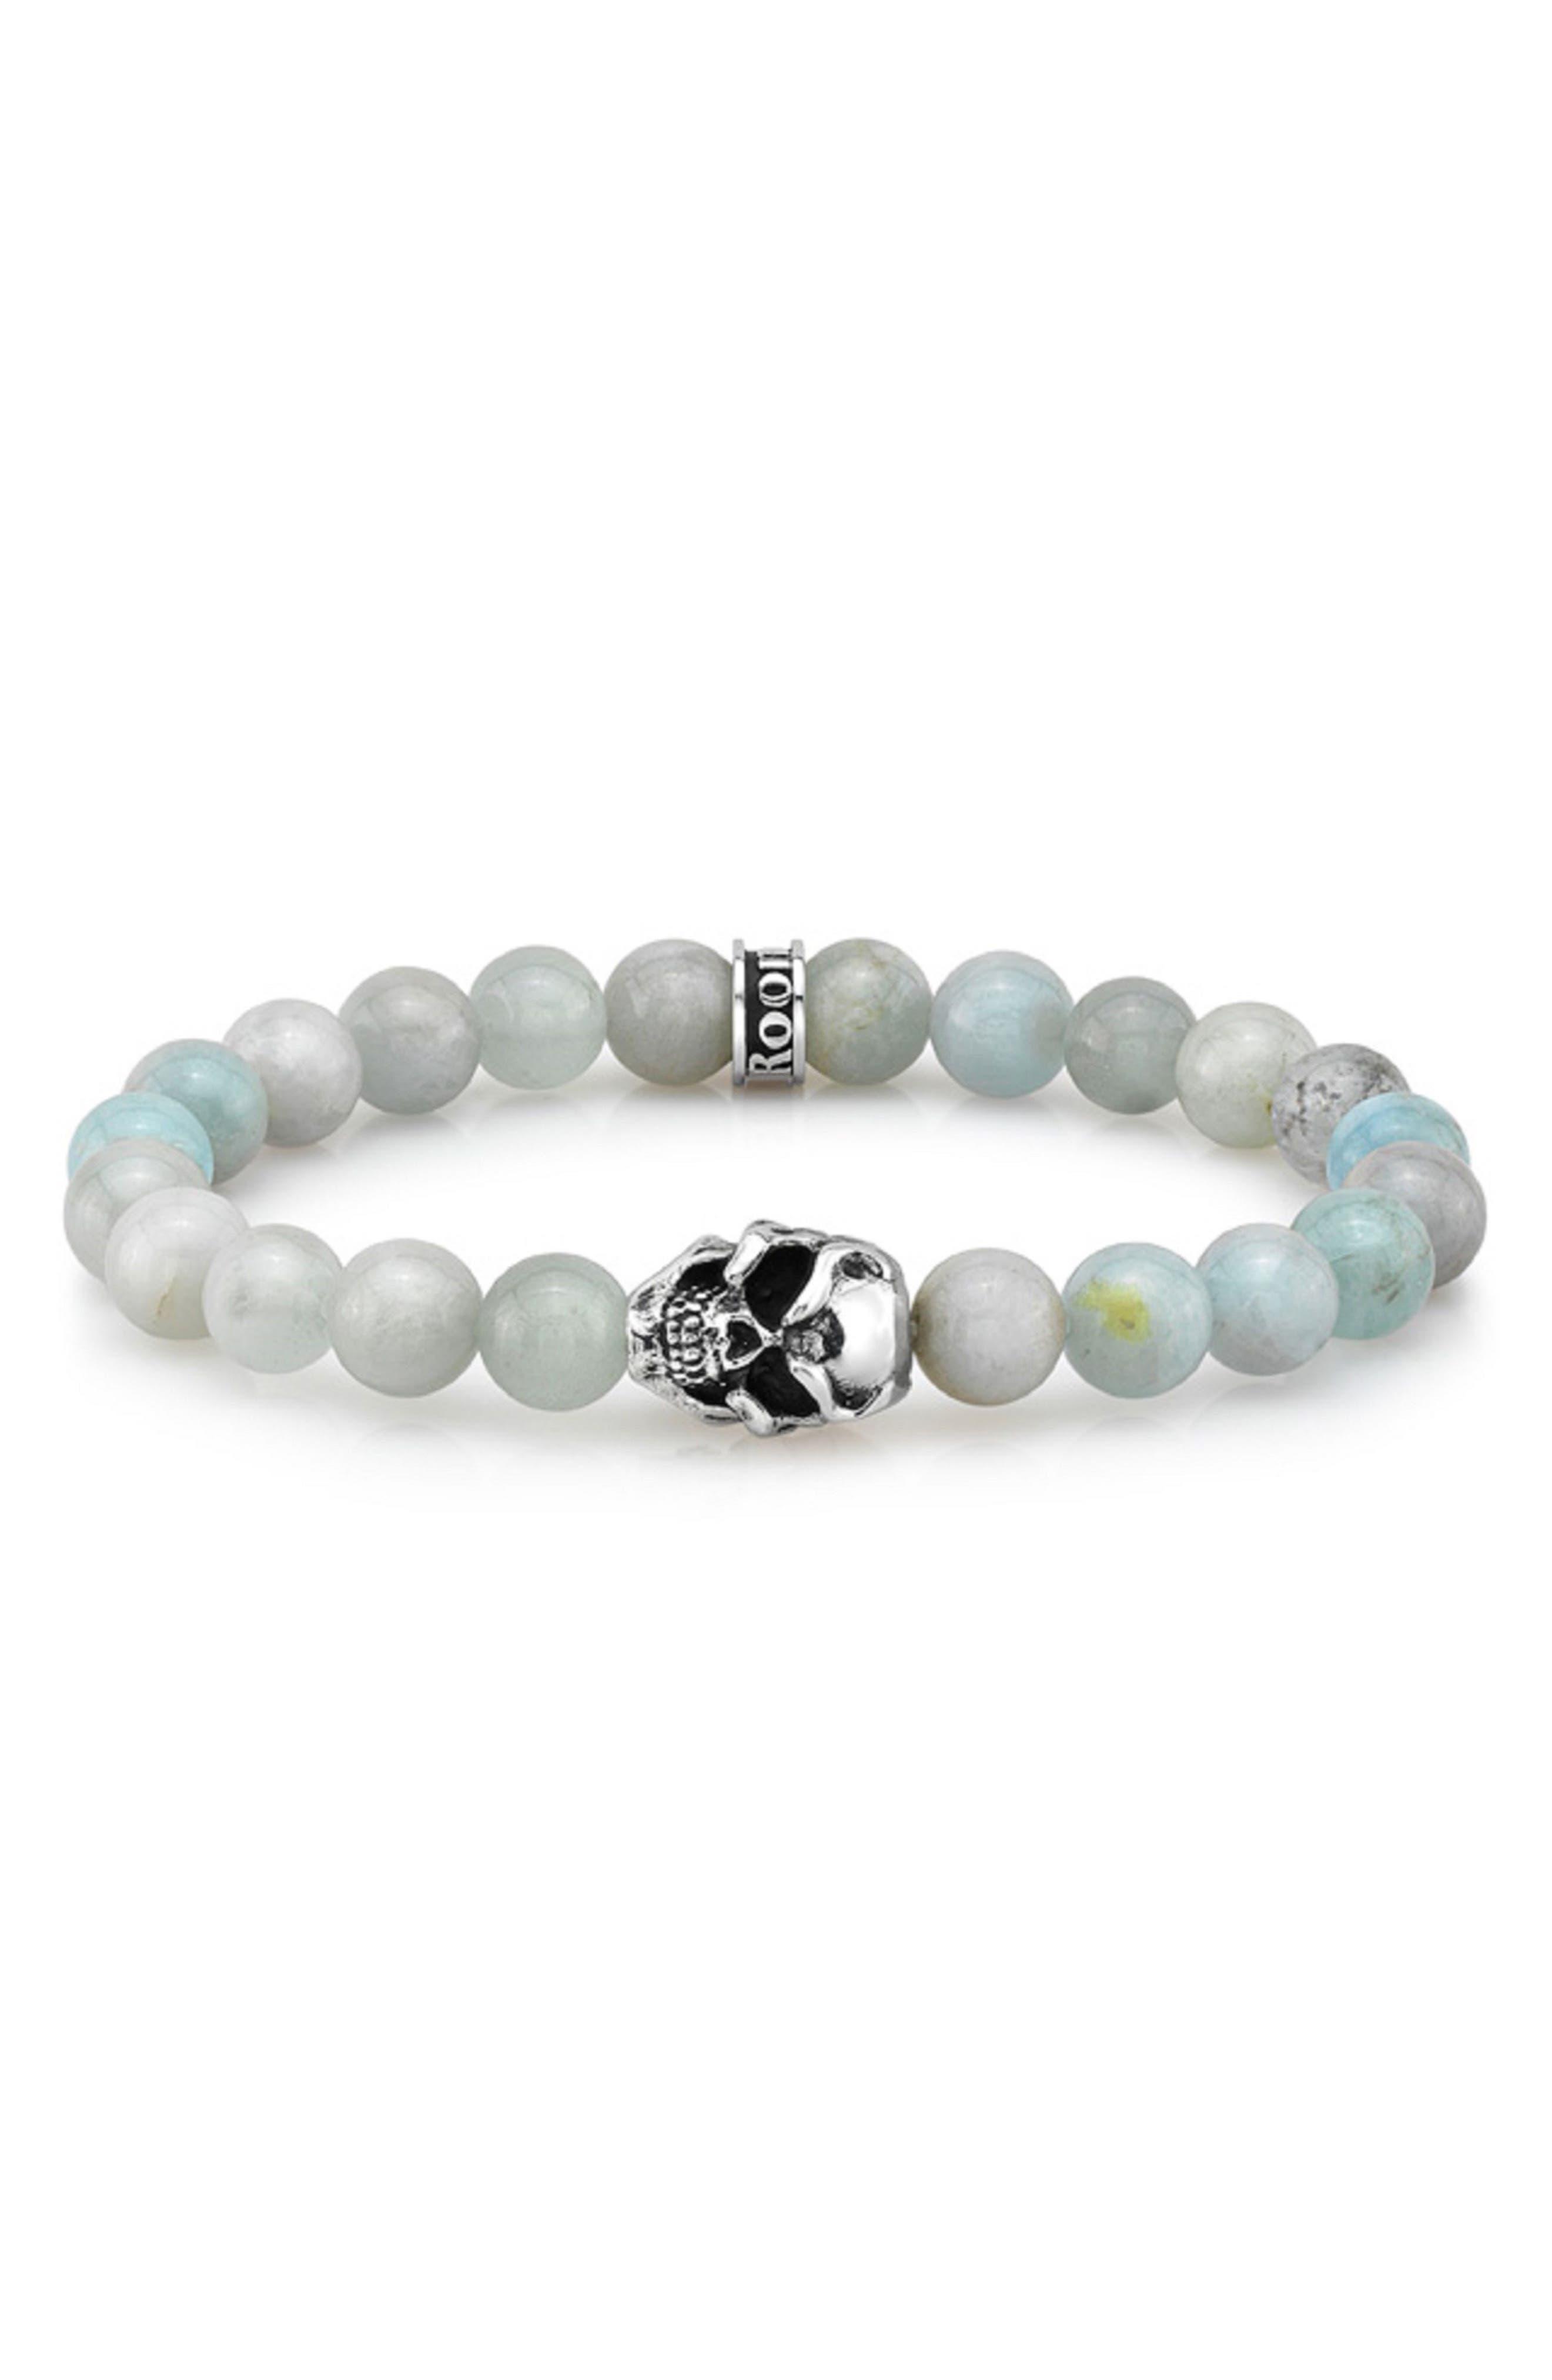 Room 101 Aquamarine Bead Bracelet,                             Main thumbnail 1, color,                             440